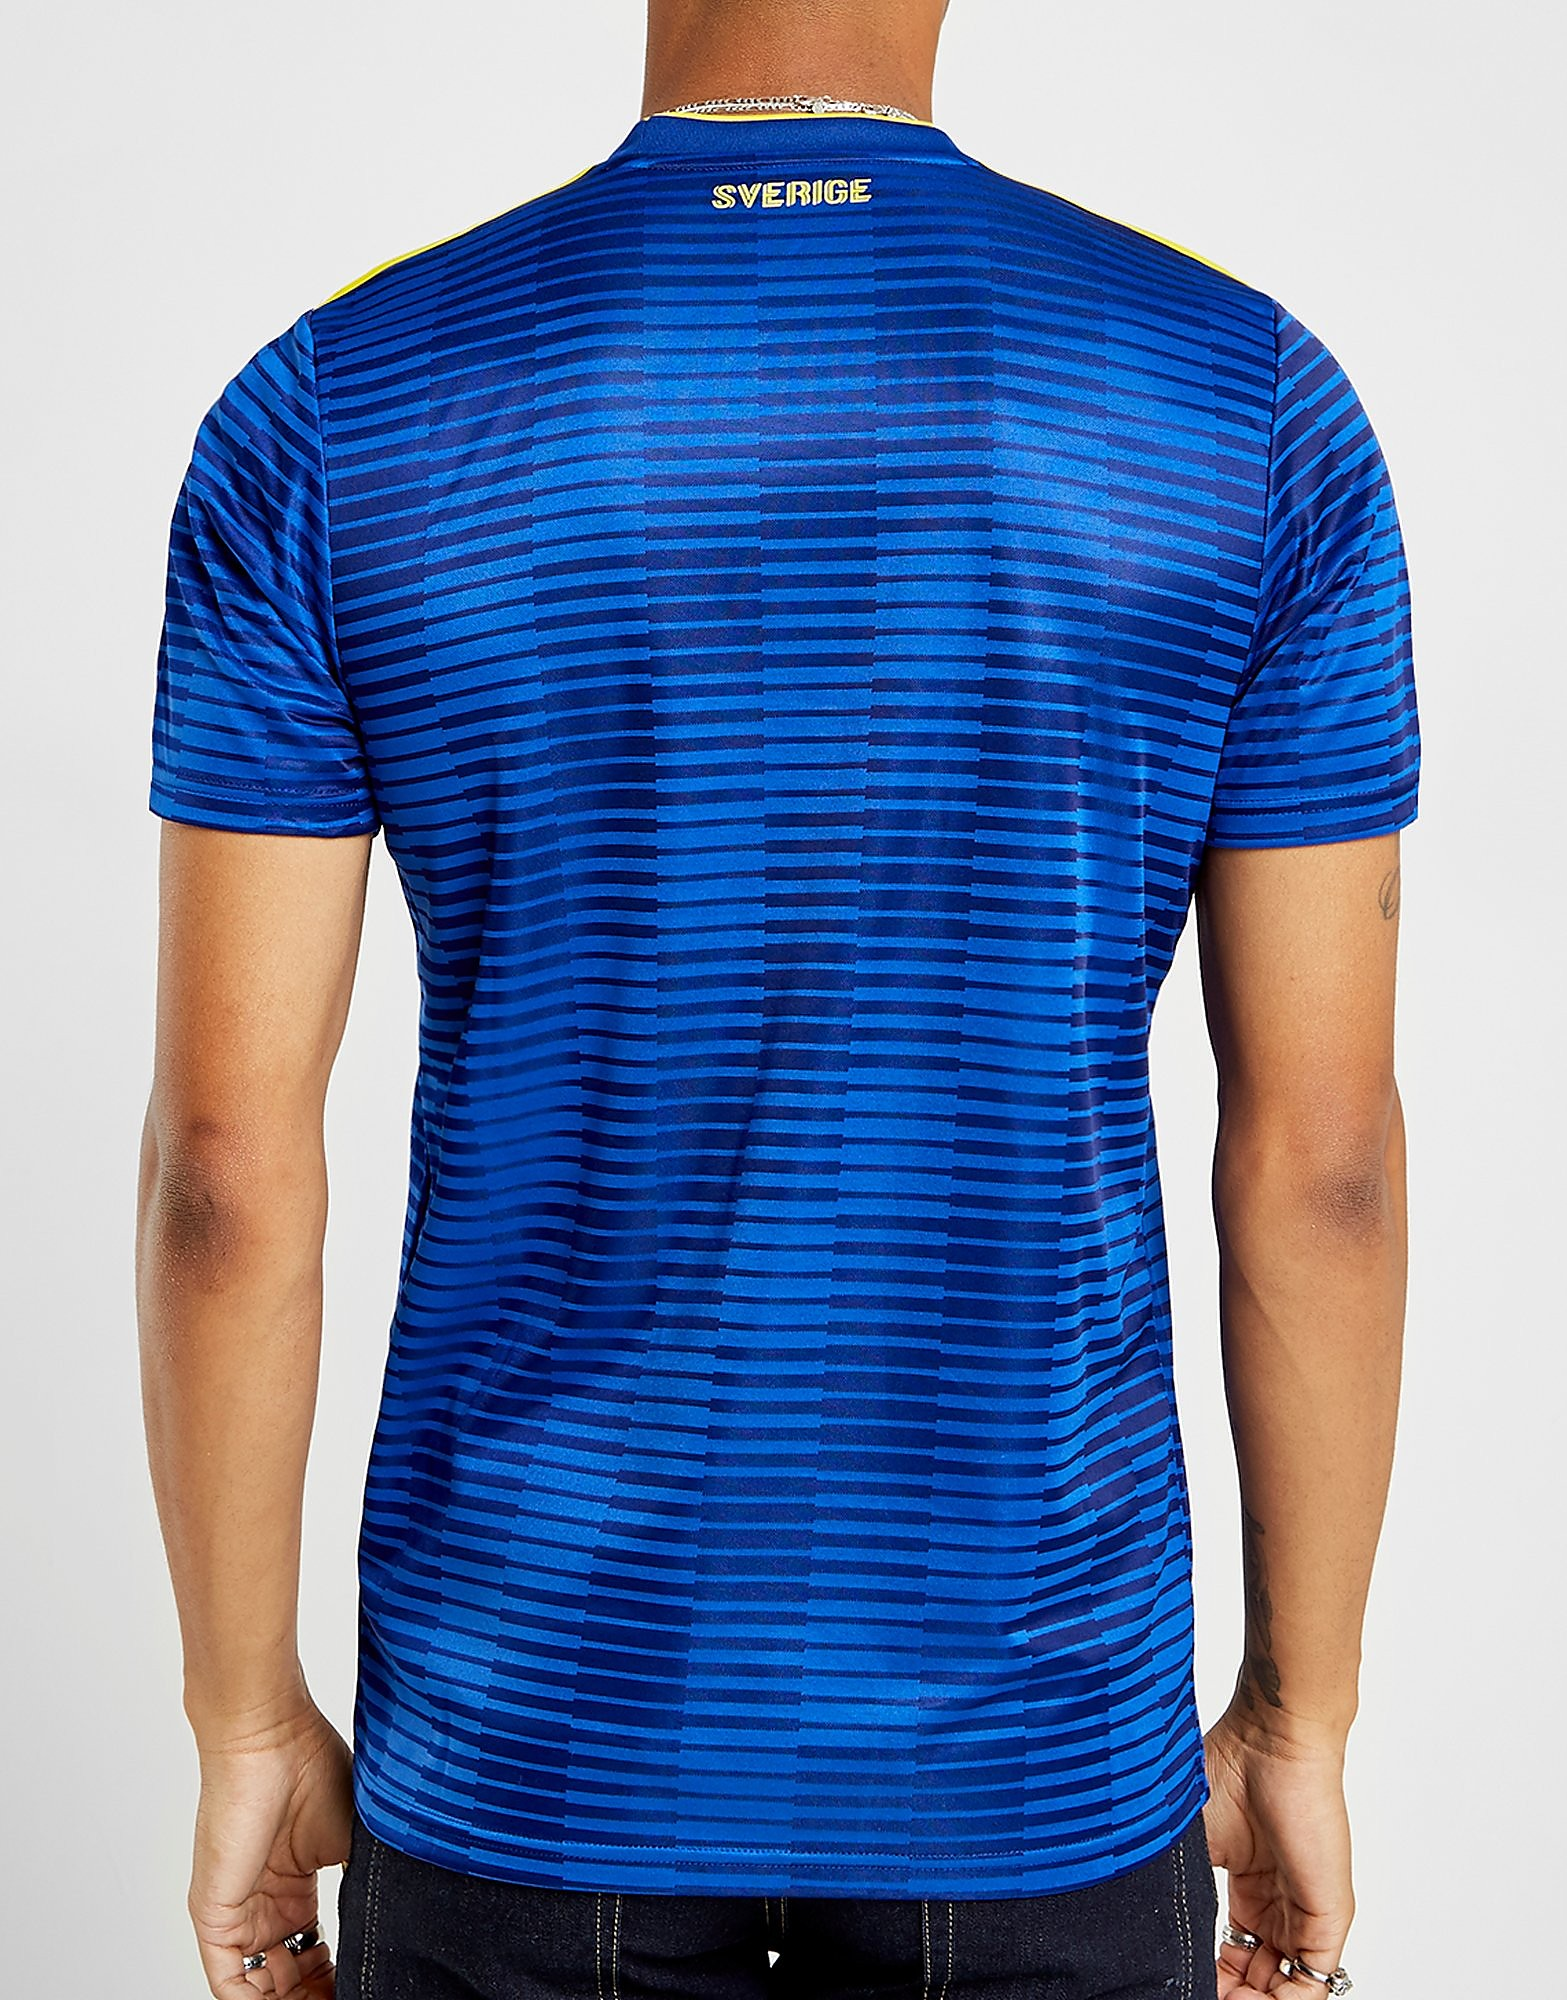 adidas camiseta Suecia 2018 2.ª equipación